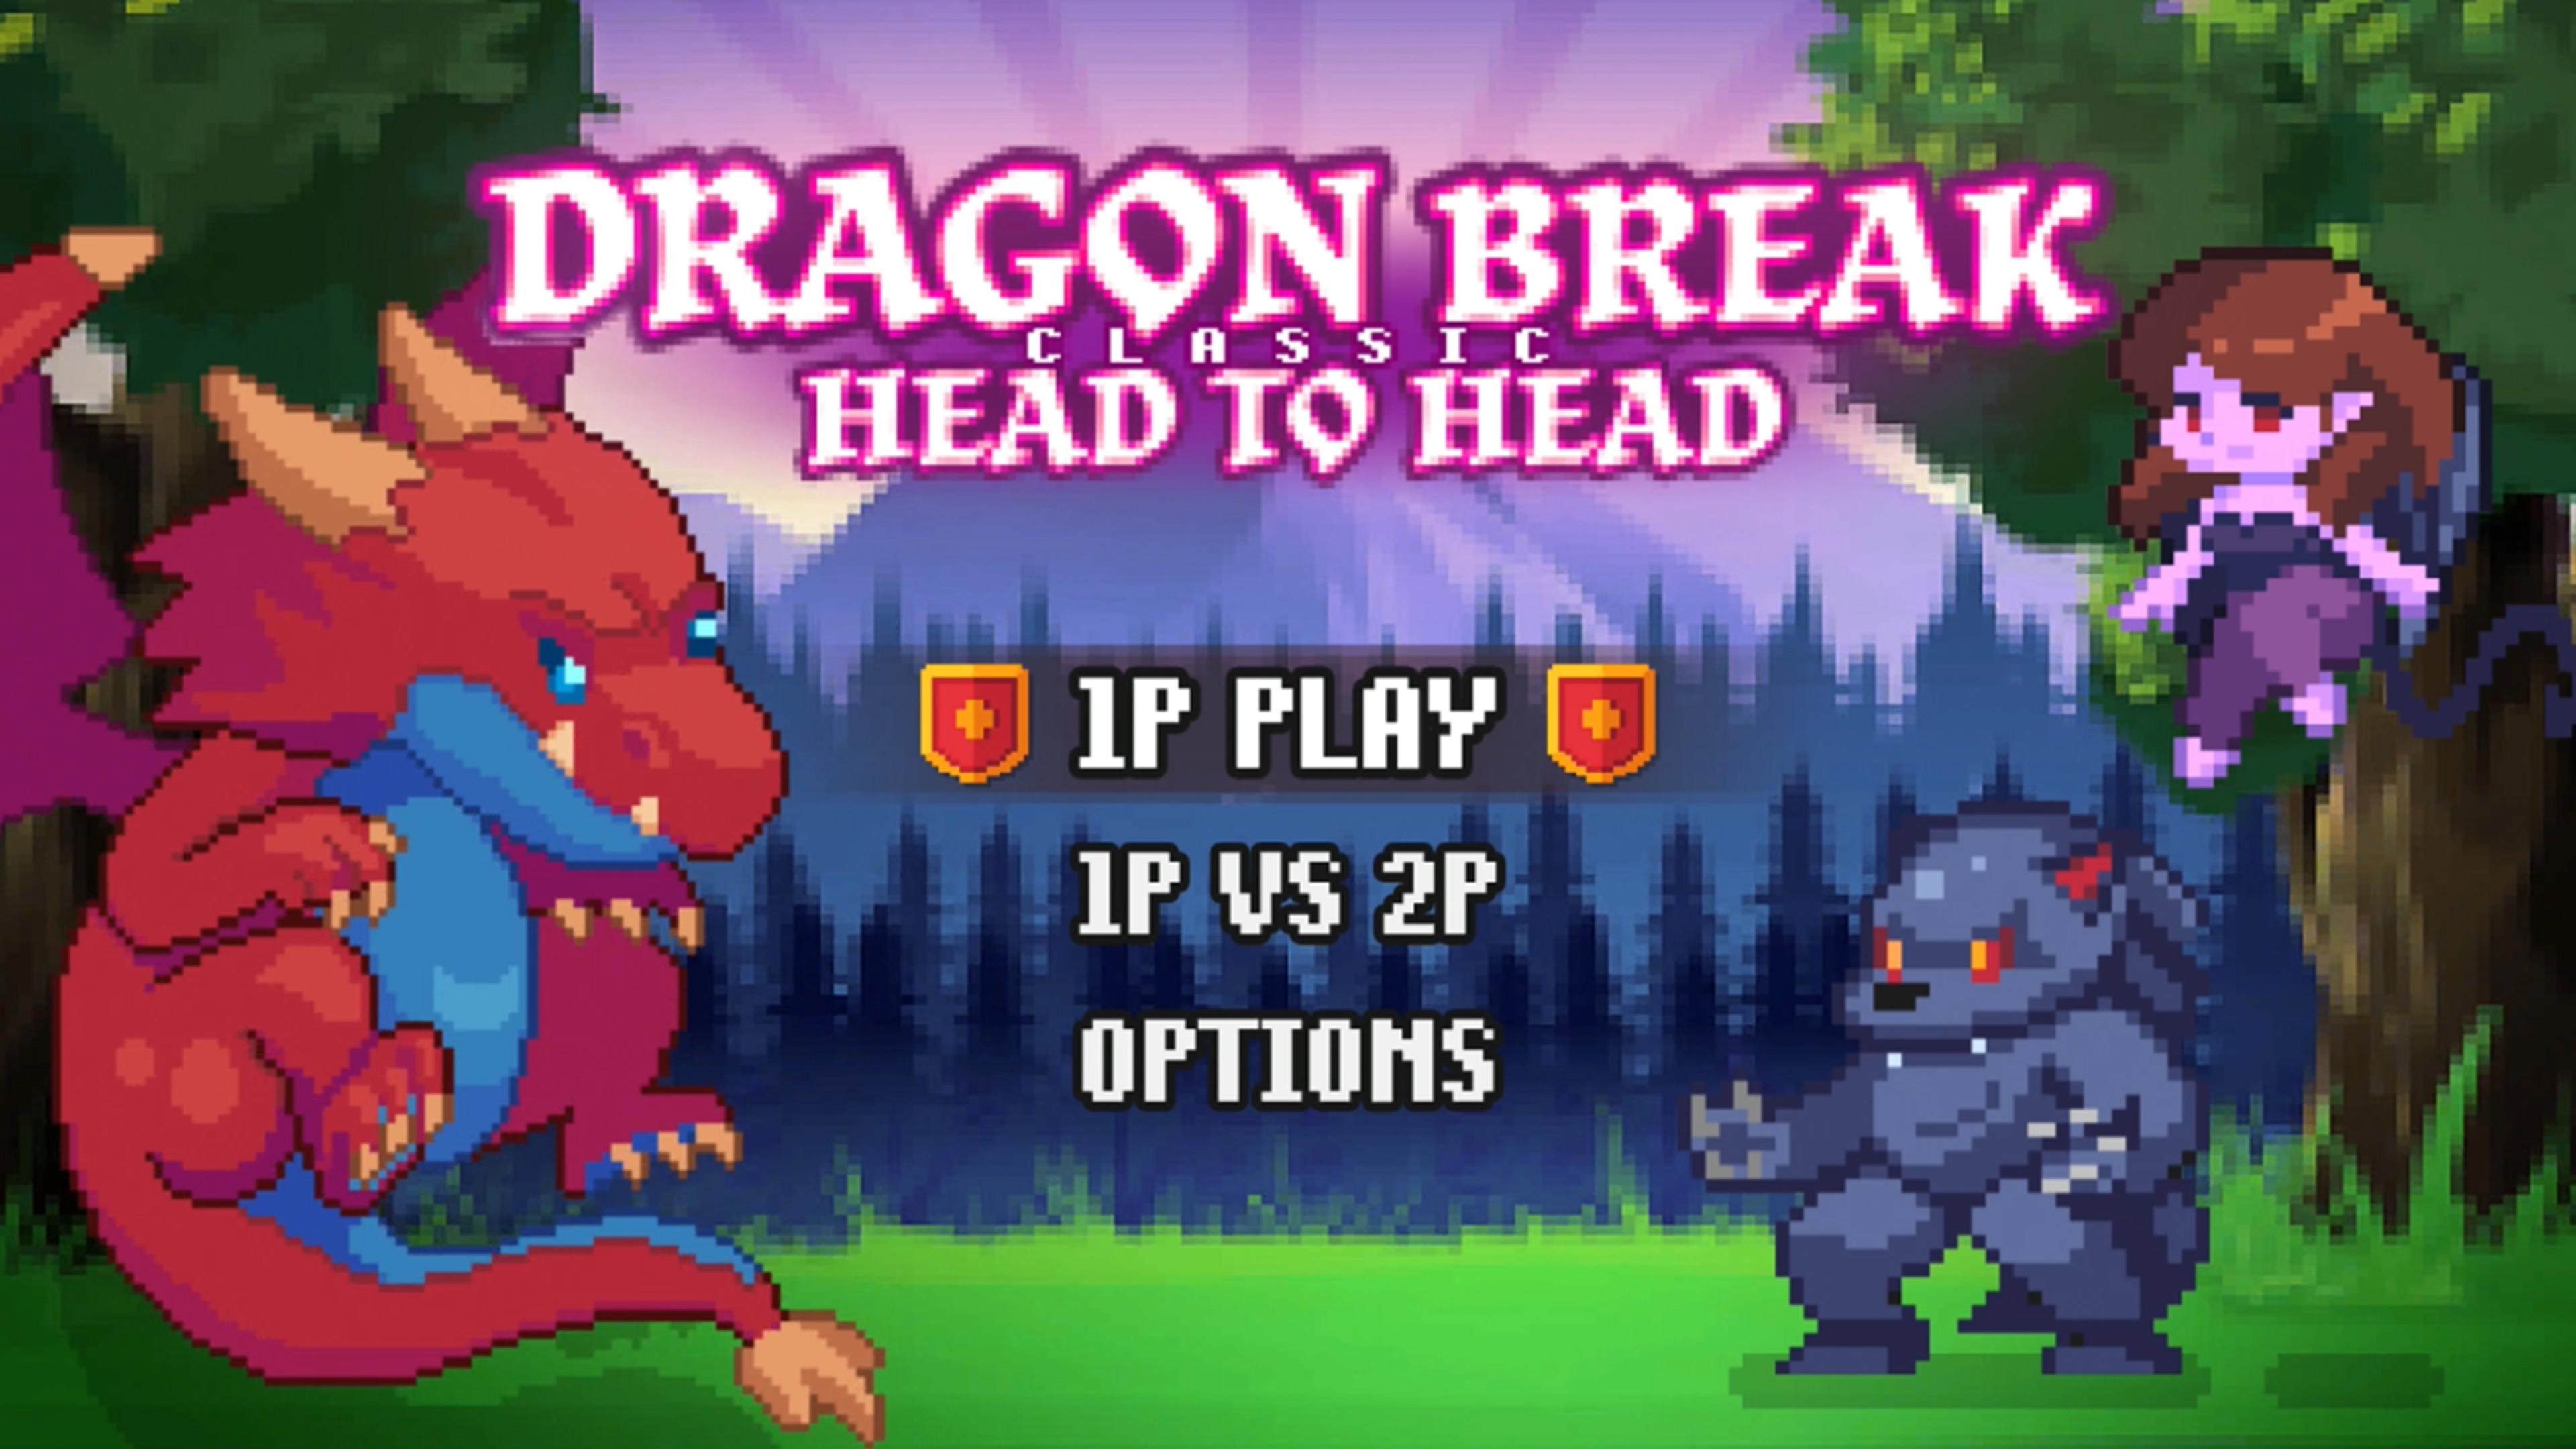 Скриншот №1 к Dragon Break Classic Head to Head - Avatar Full Game Bundle